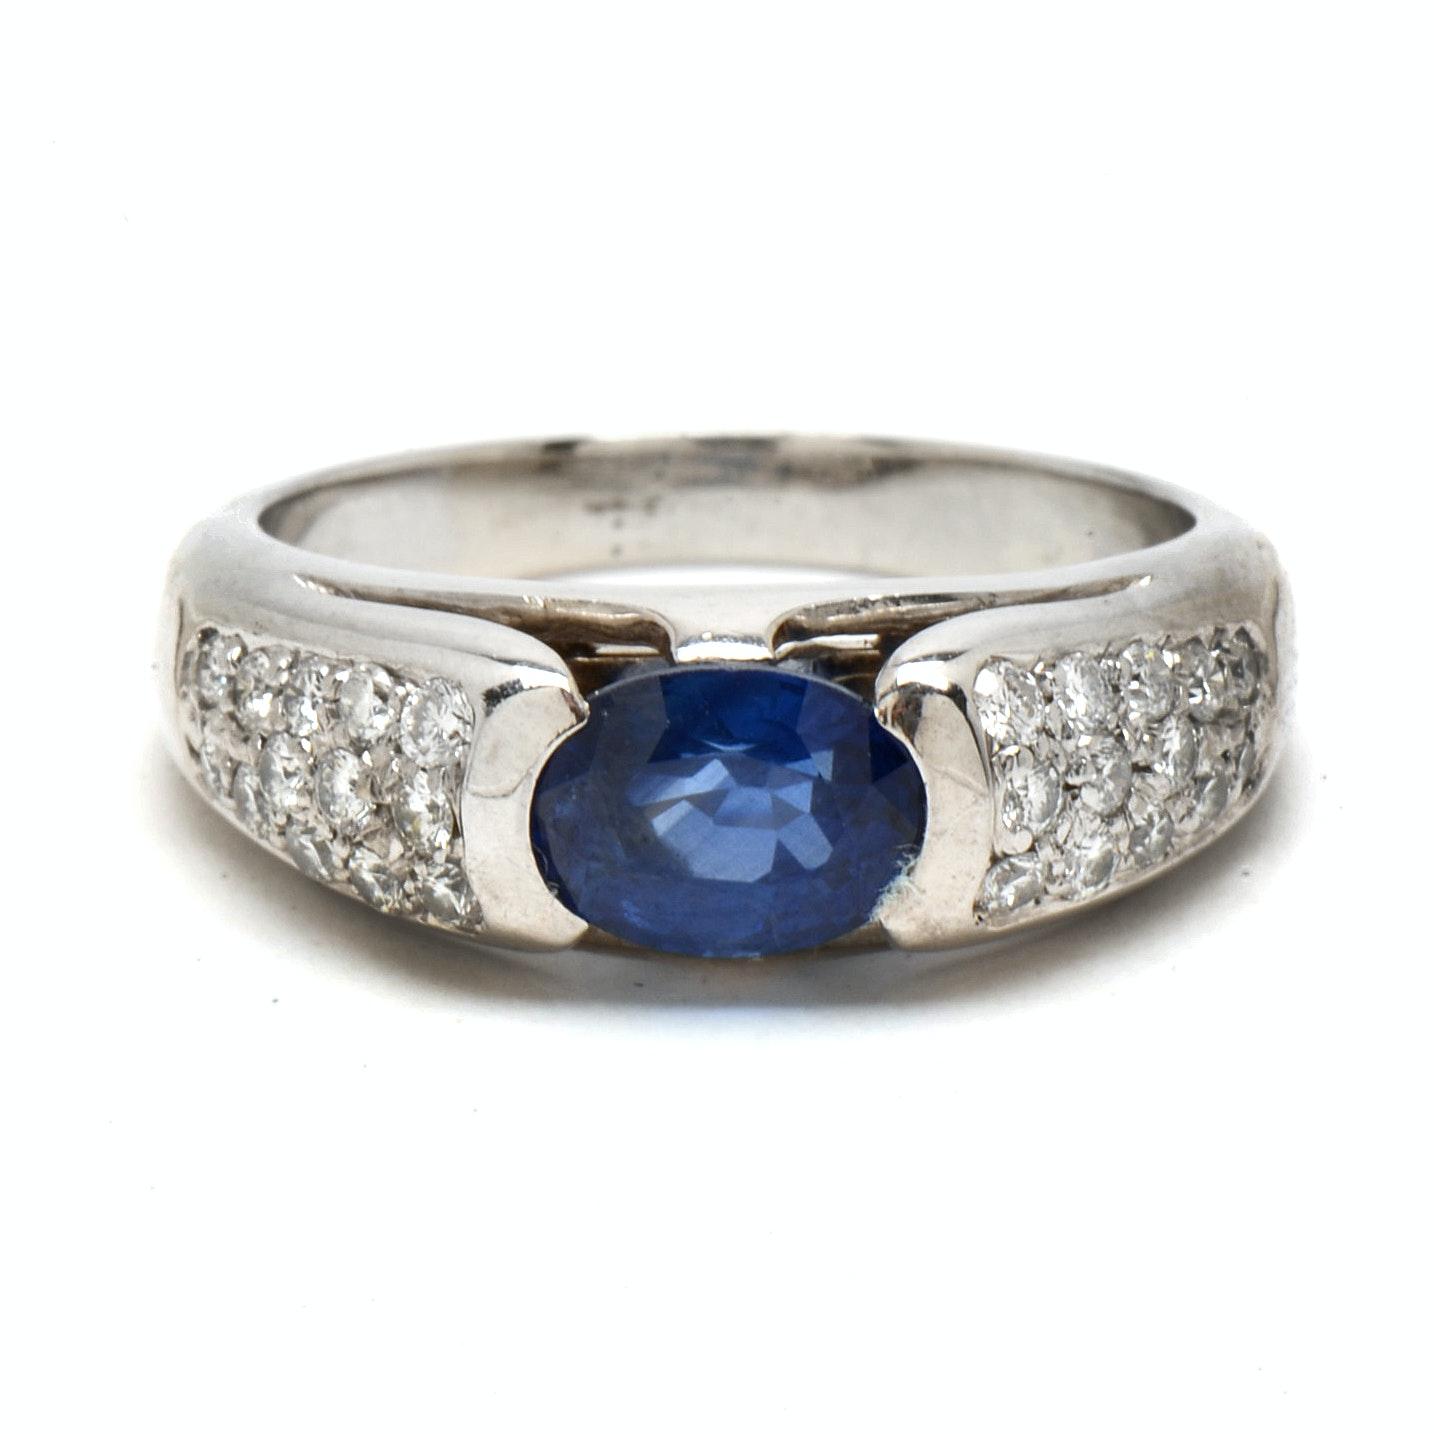 18K White Gold Natural Sapphire and Pavé Set Diamond Ring